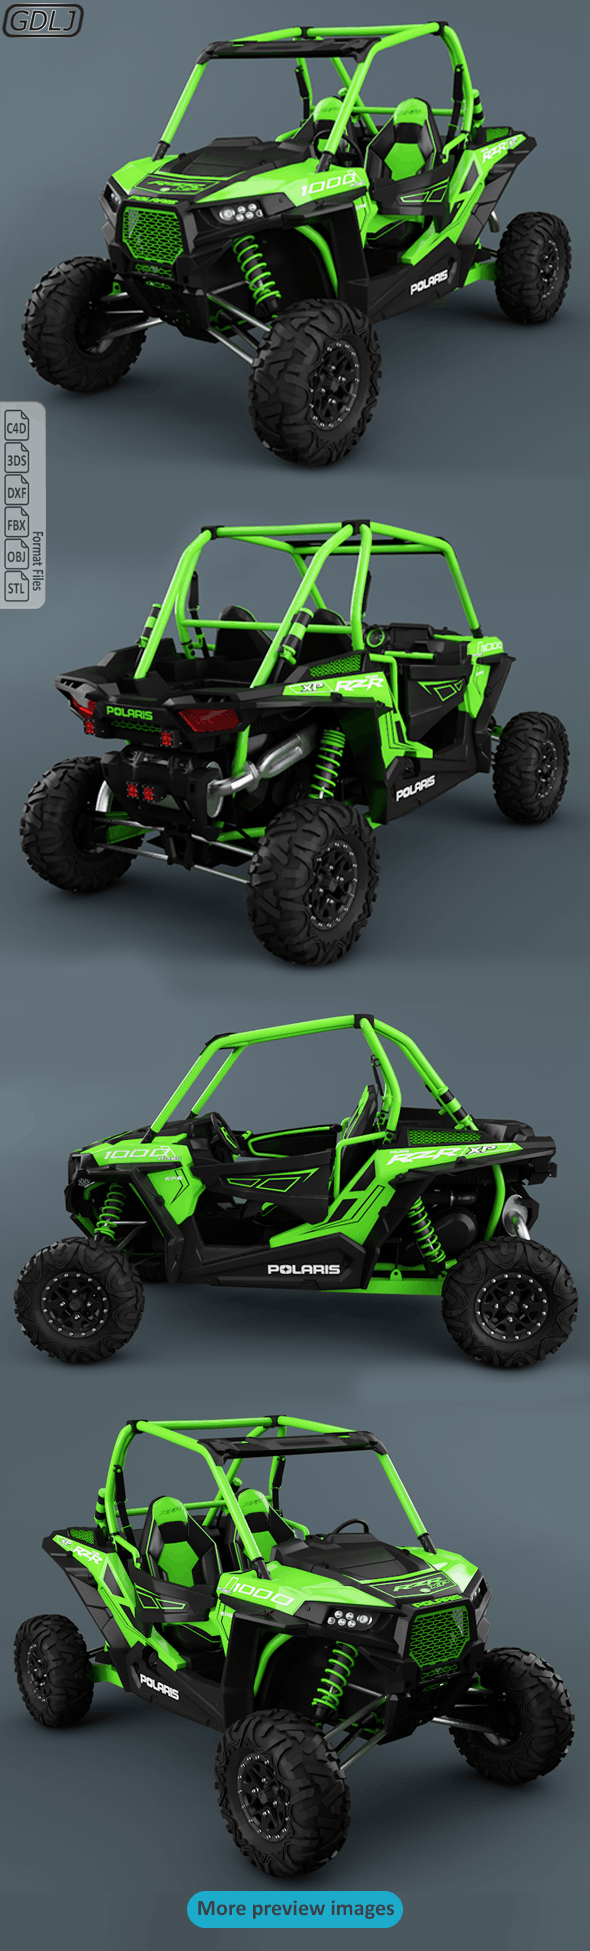 Polaris Ranger RZR 1000 - 3DOcean Item for Sale